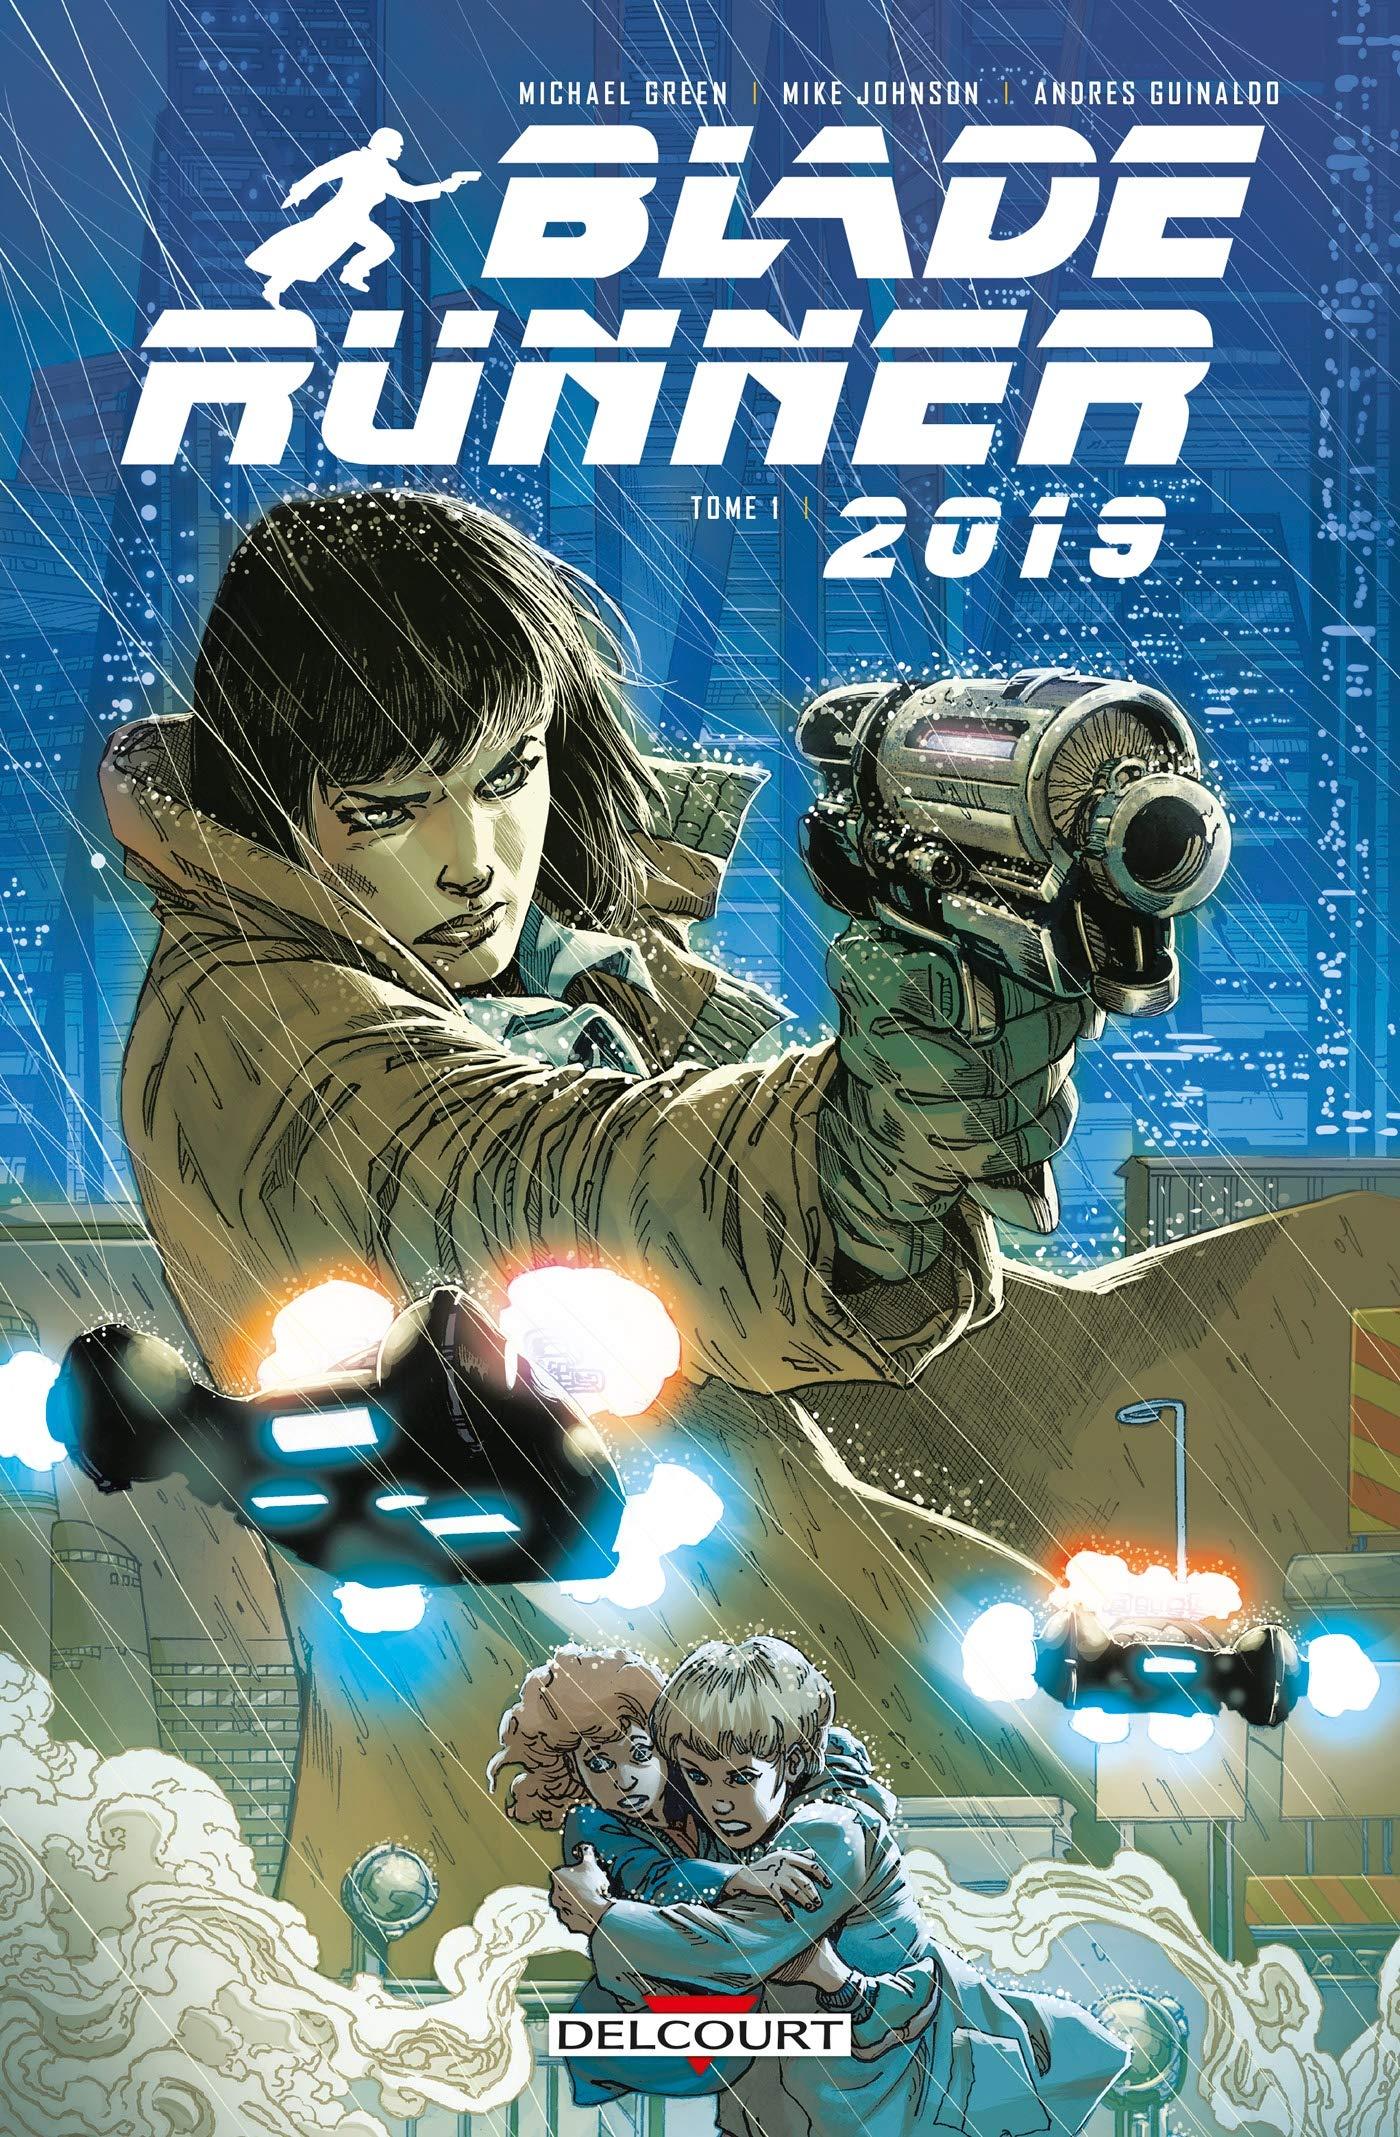 Blade Runner 2019 1 - Tome 1